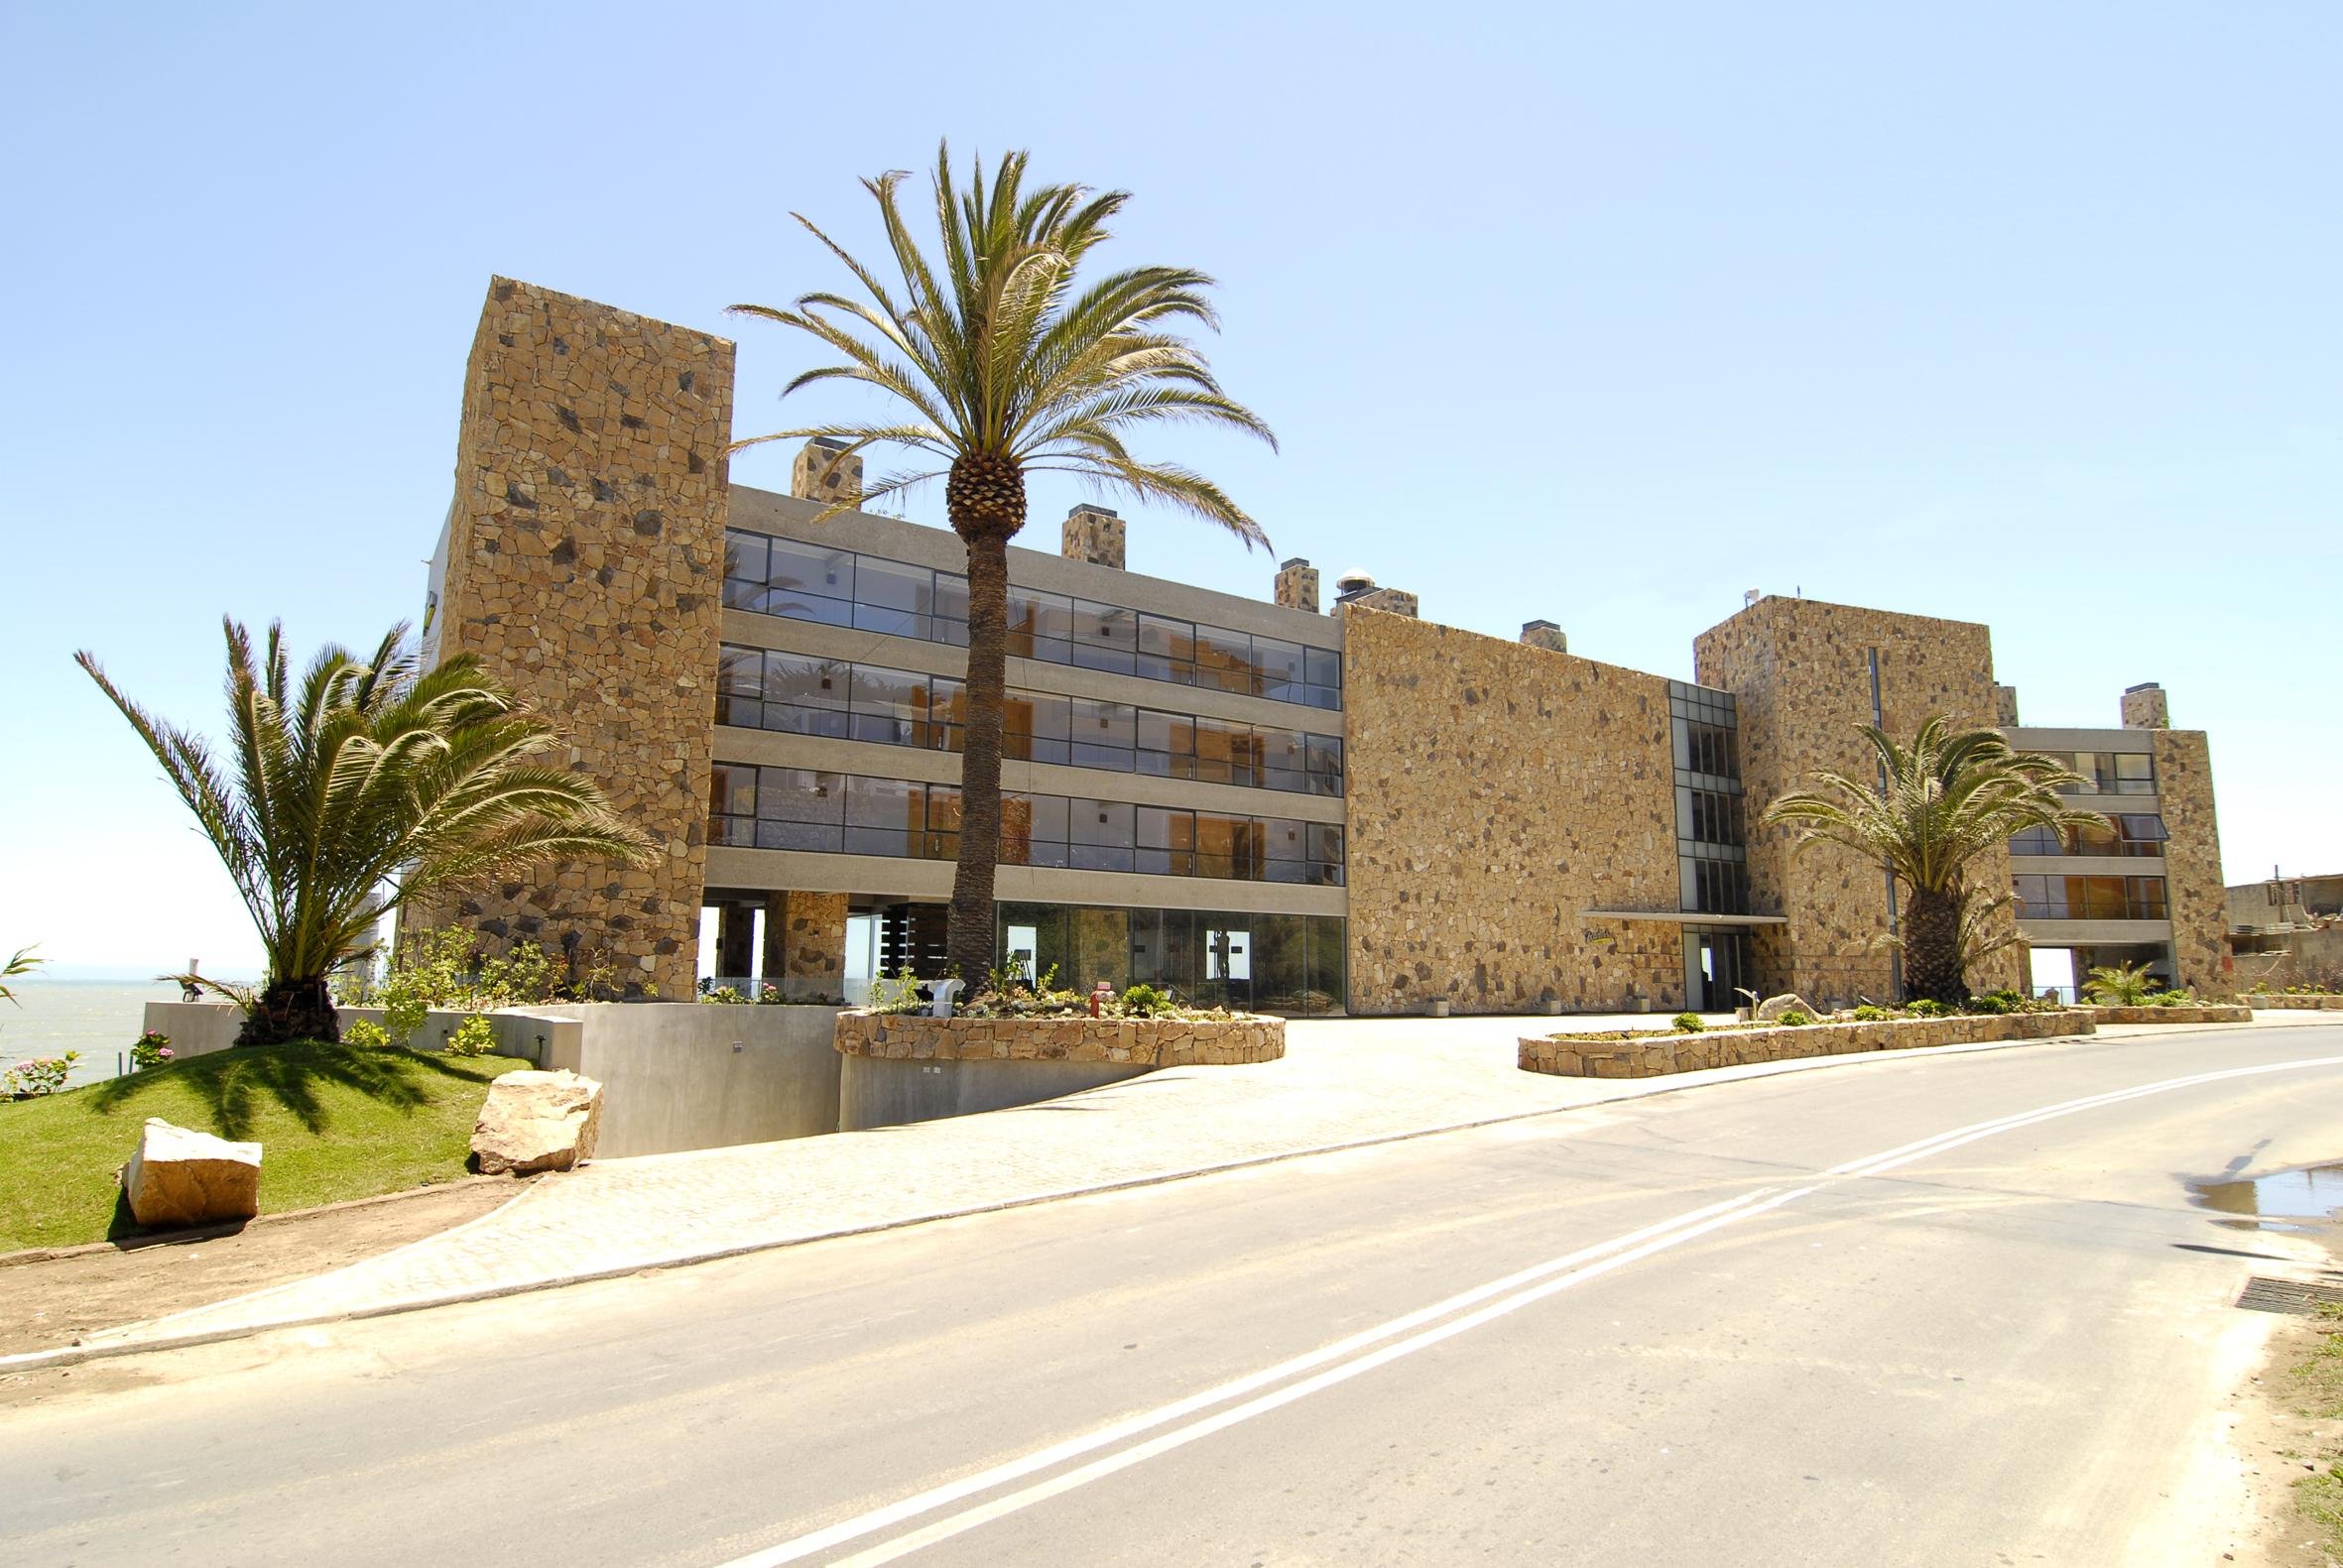 Hotel Radisson Acqua